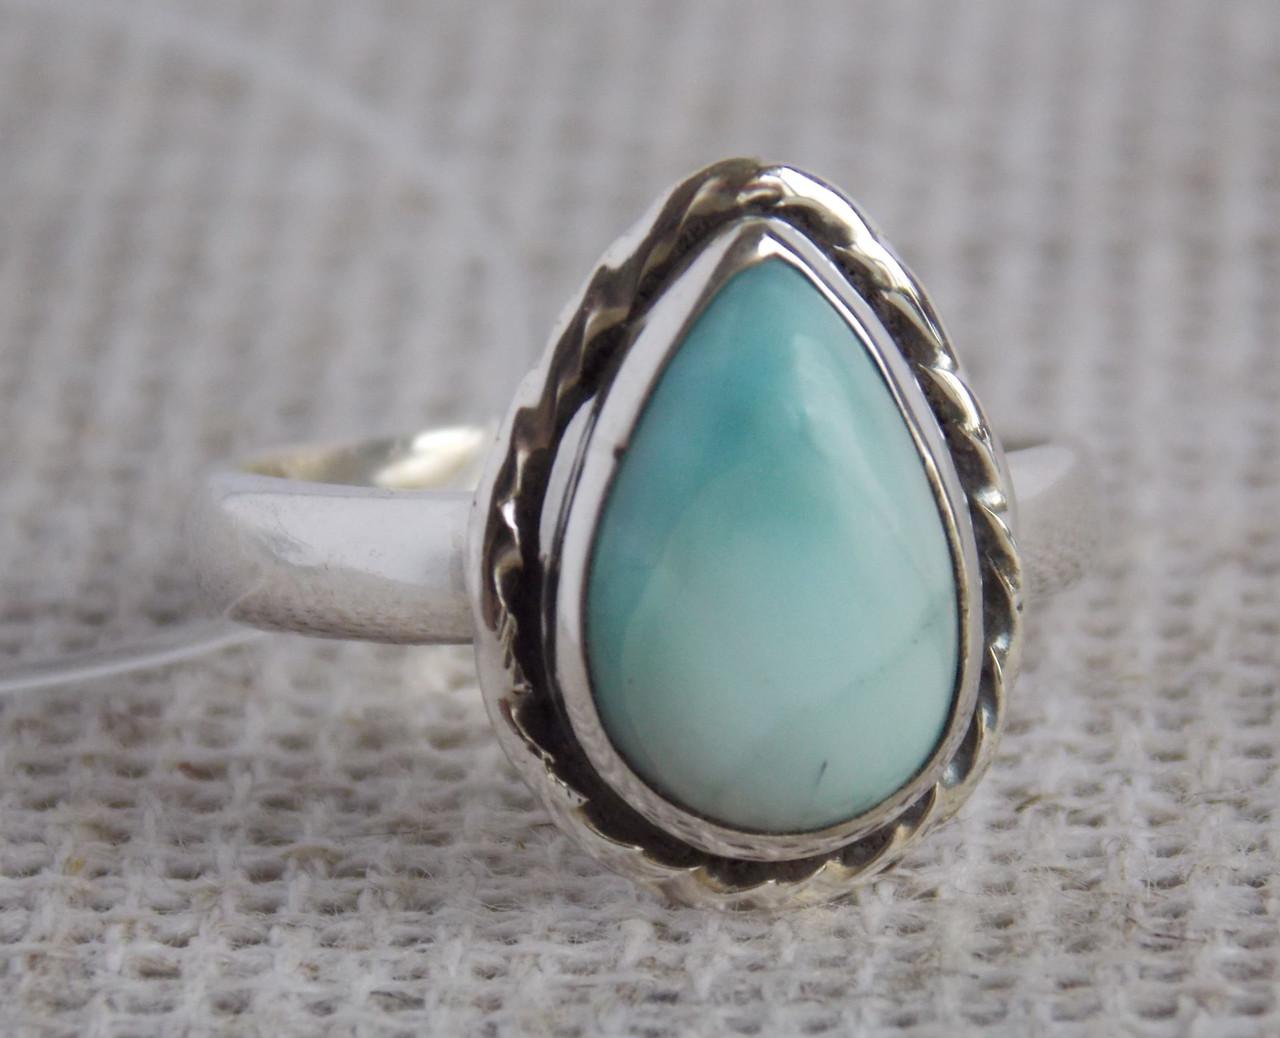 Серебряное кольцо с ларимаром 16 размера